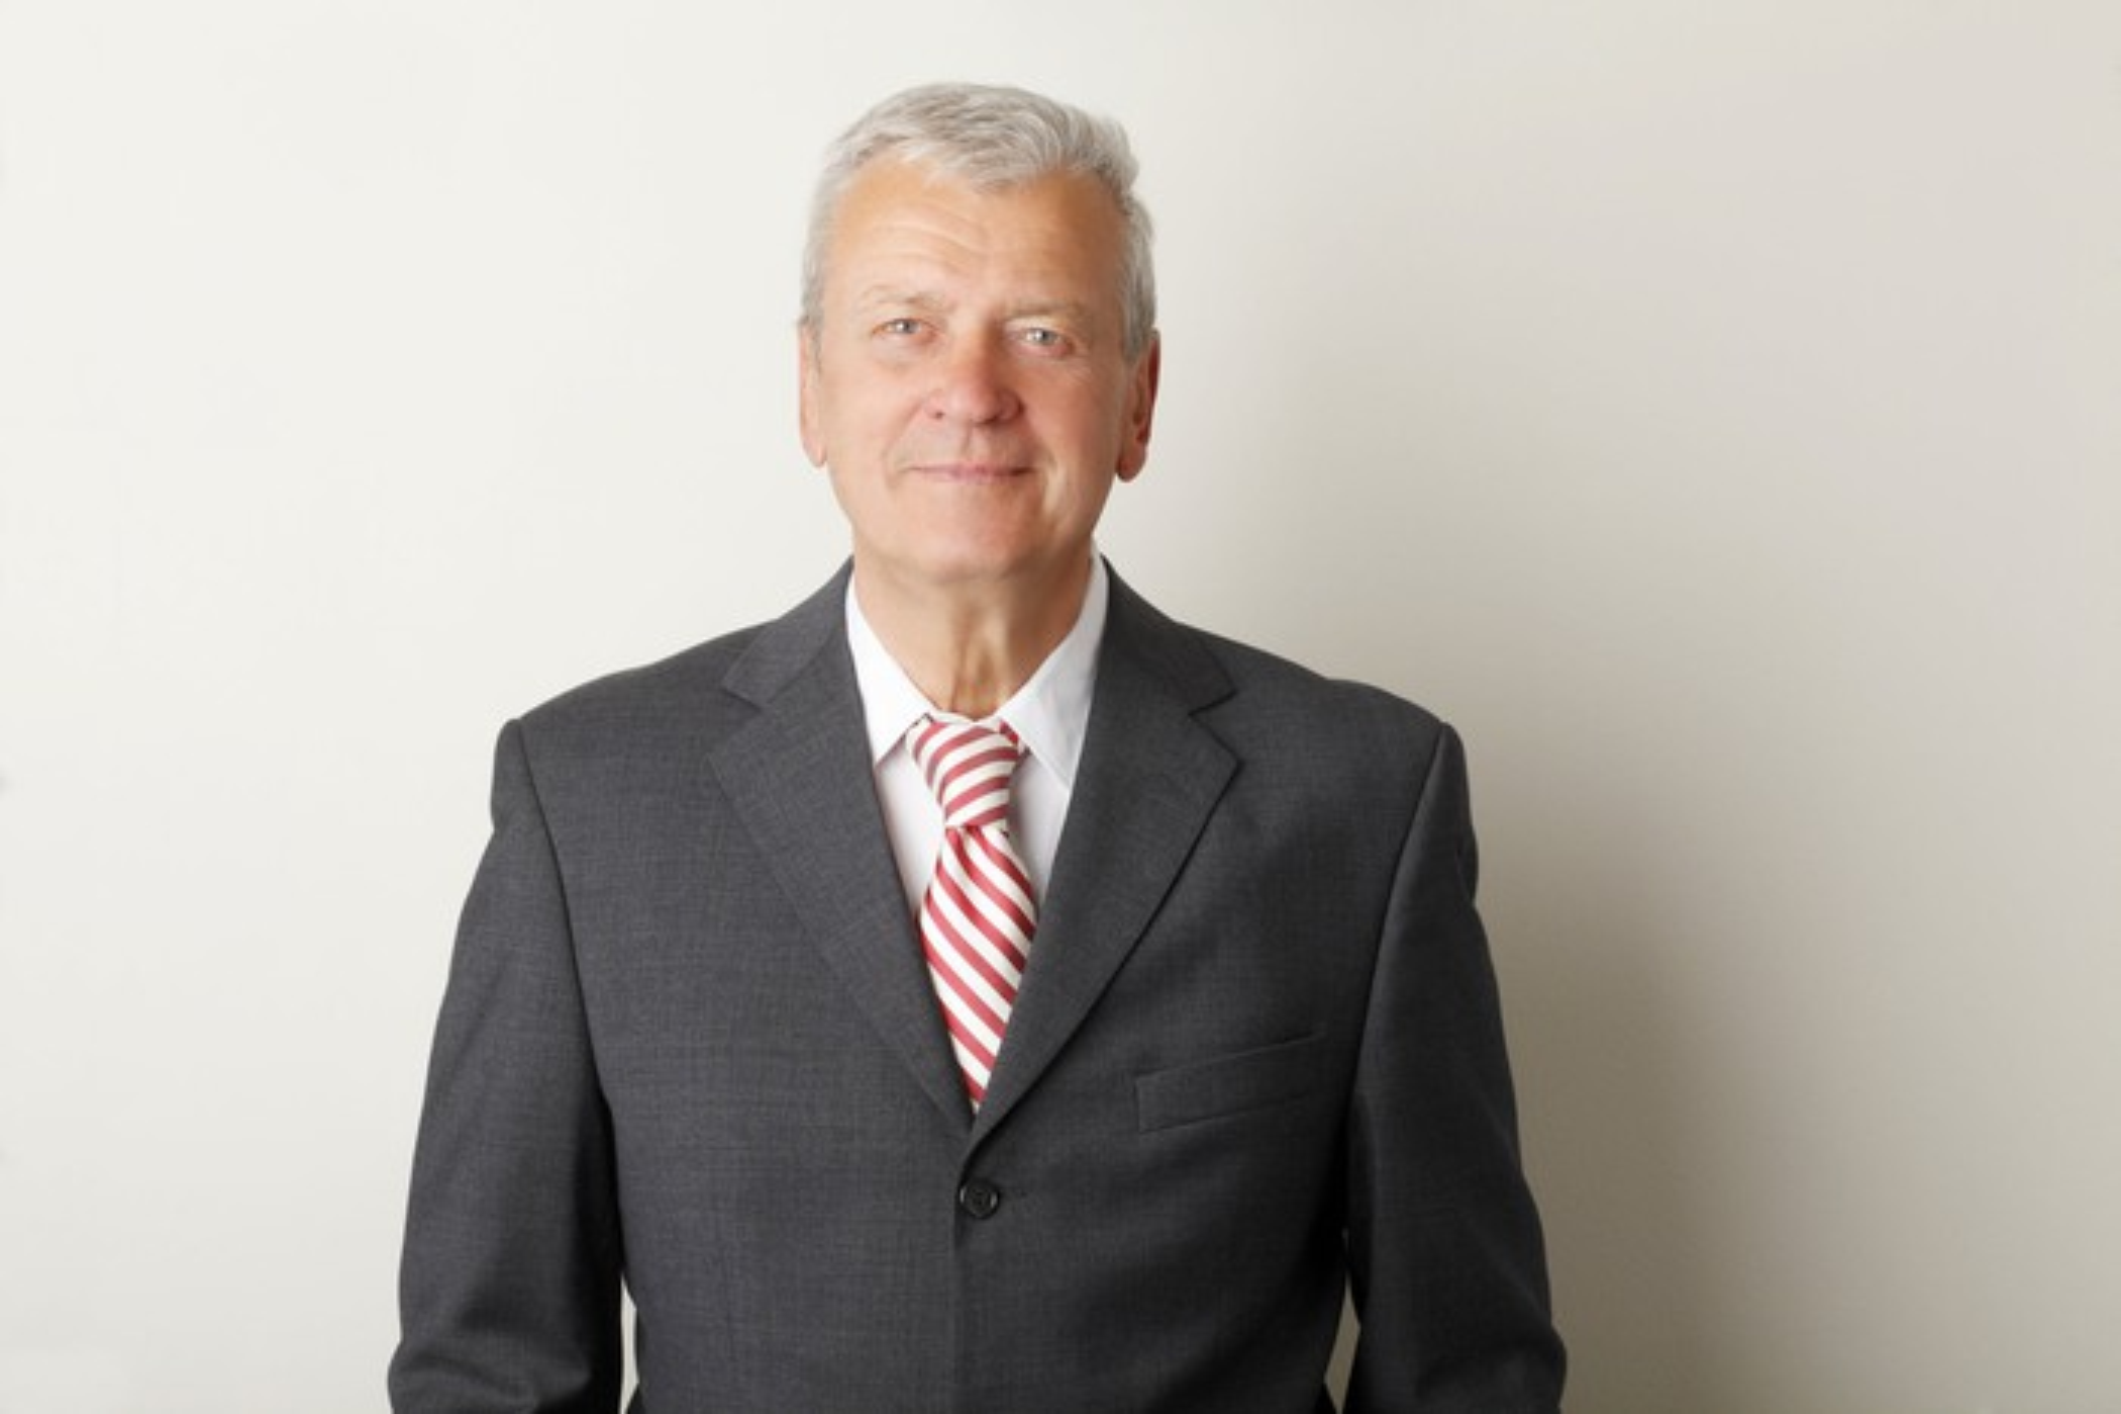 Older man in business suit